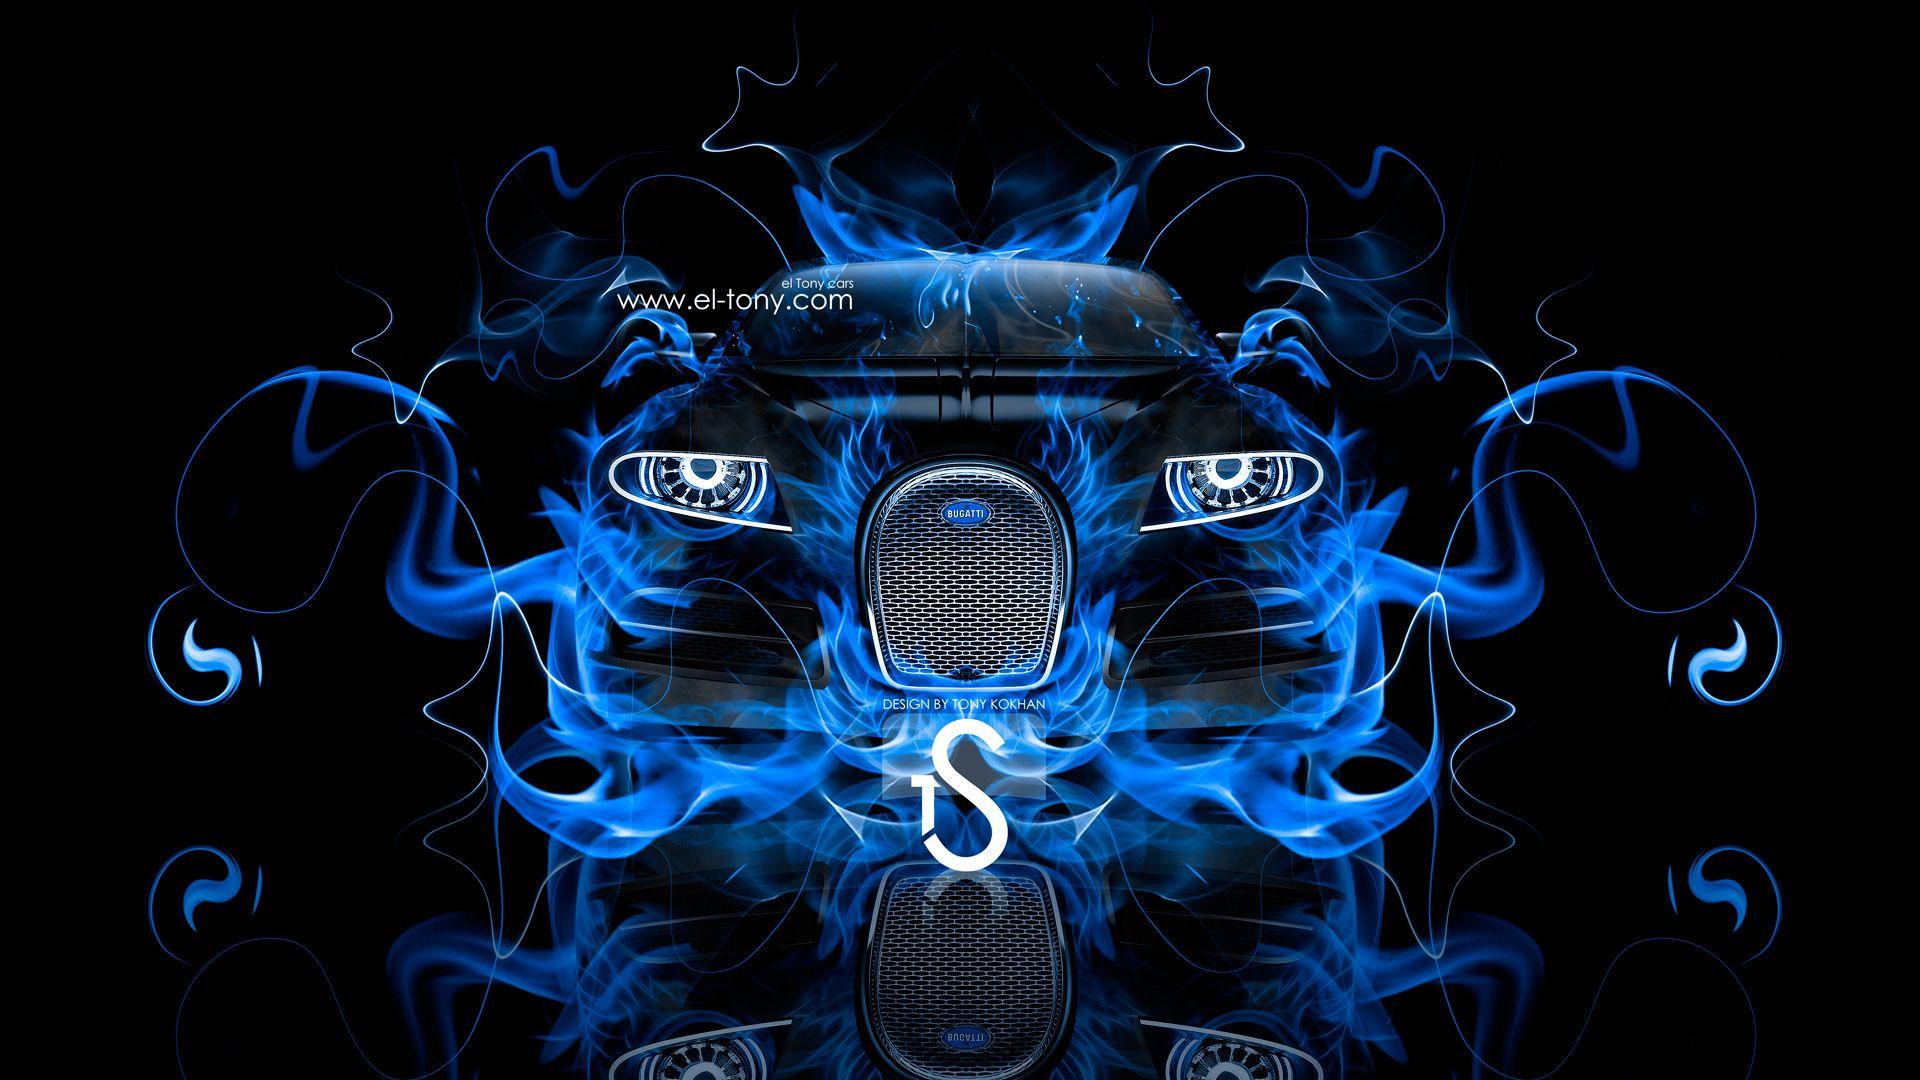 Gold Bugatti Veyron With Neon   Bugatti 16C Galibier Blue Fire Car 2013 HD Wallpapers Design By Tony  .